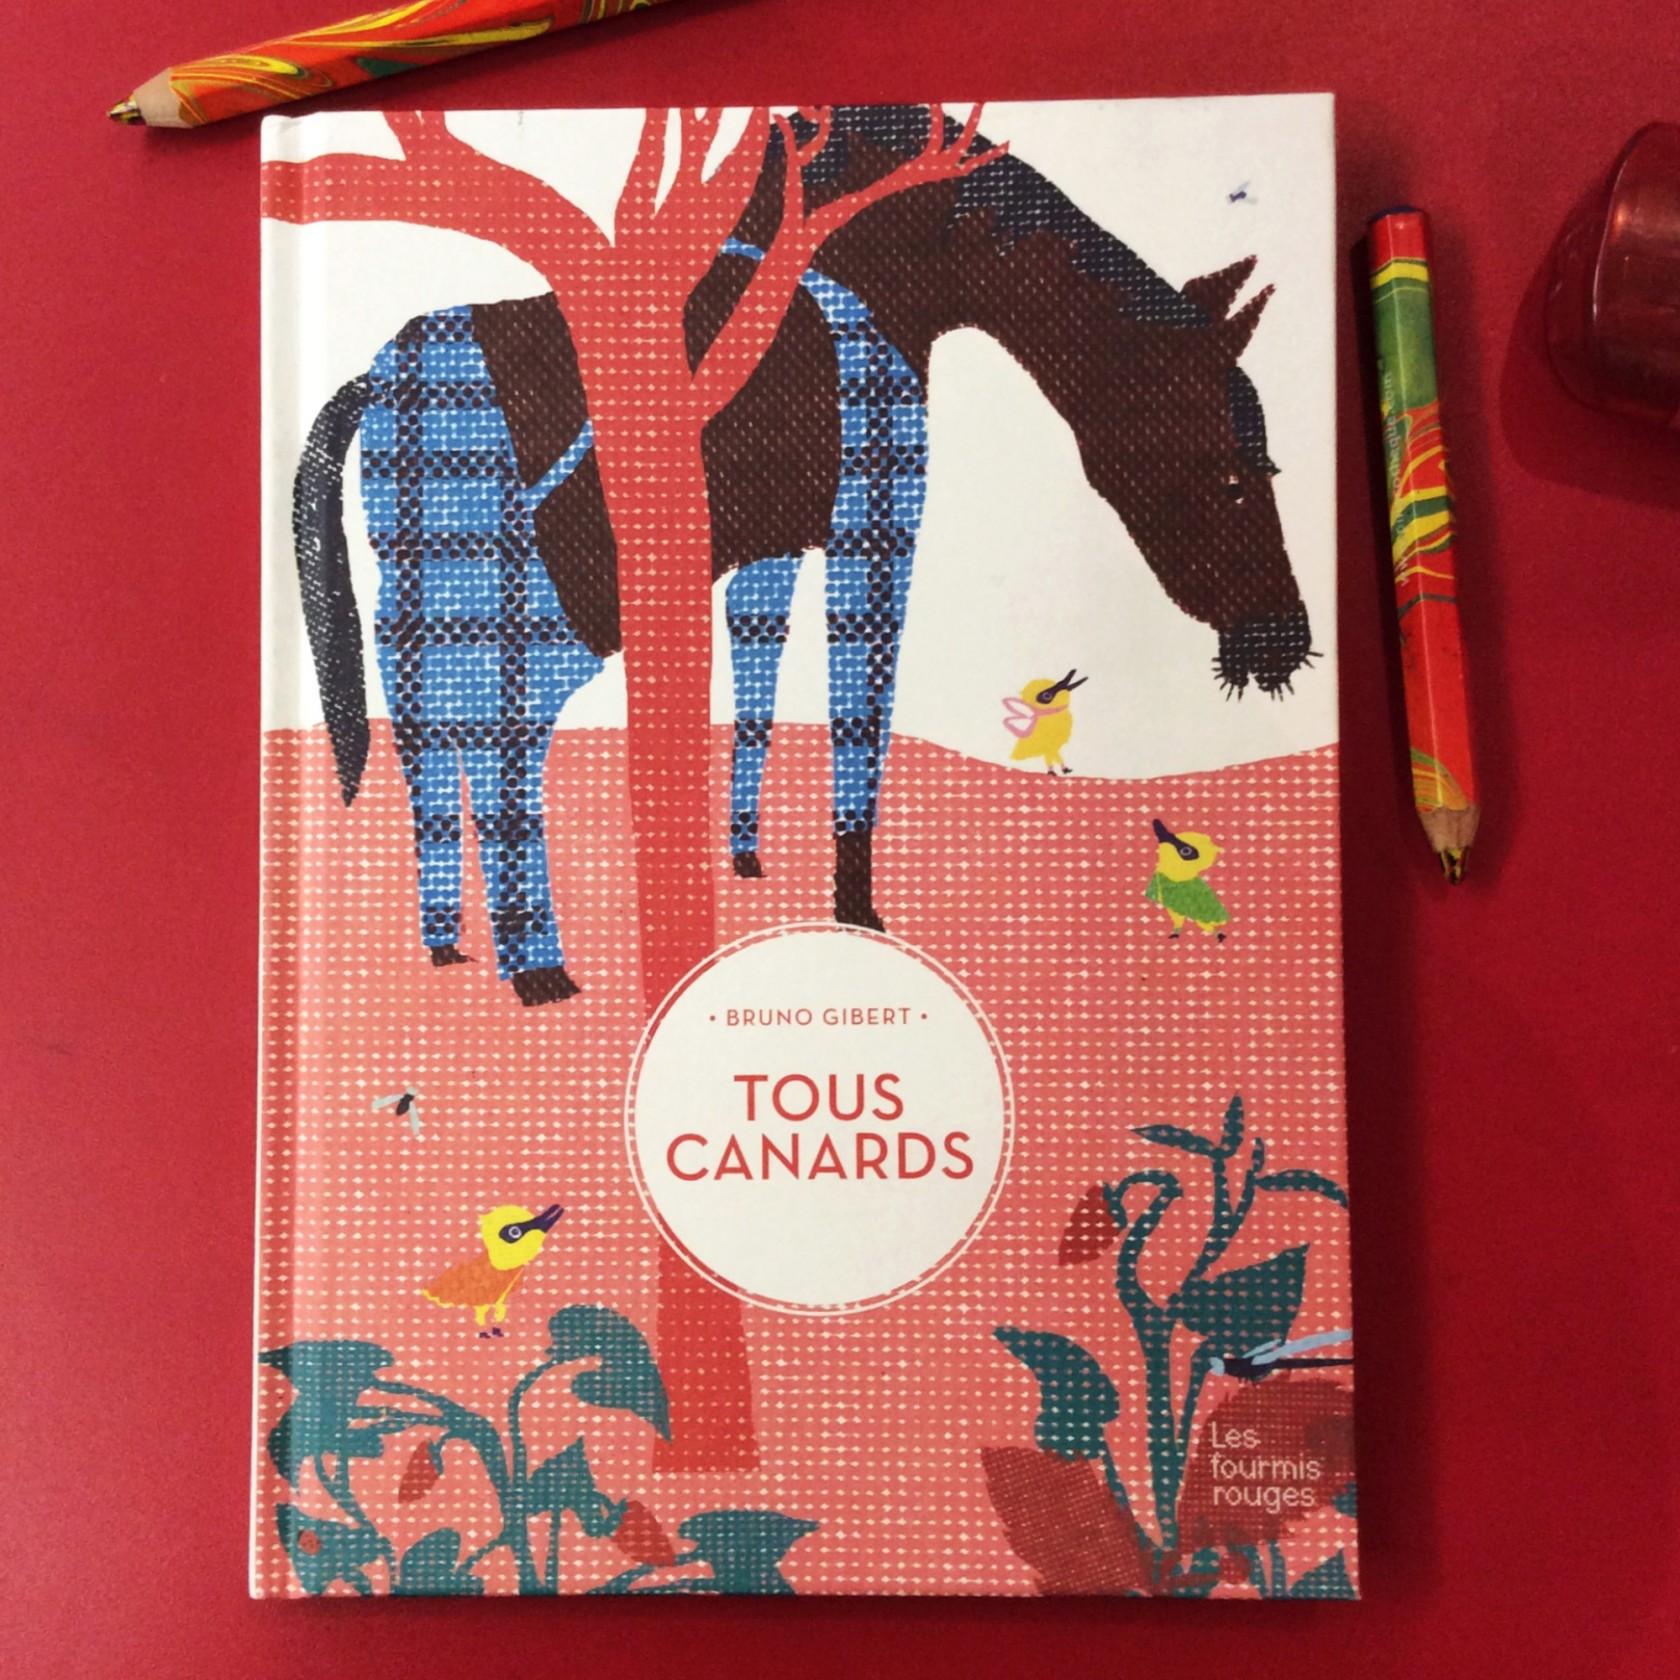 fouinzanardi -  fz_print.books_lesfourmisrouges4